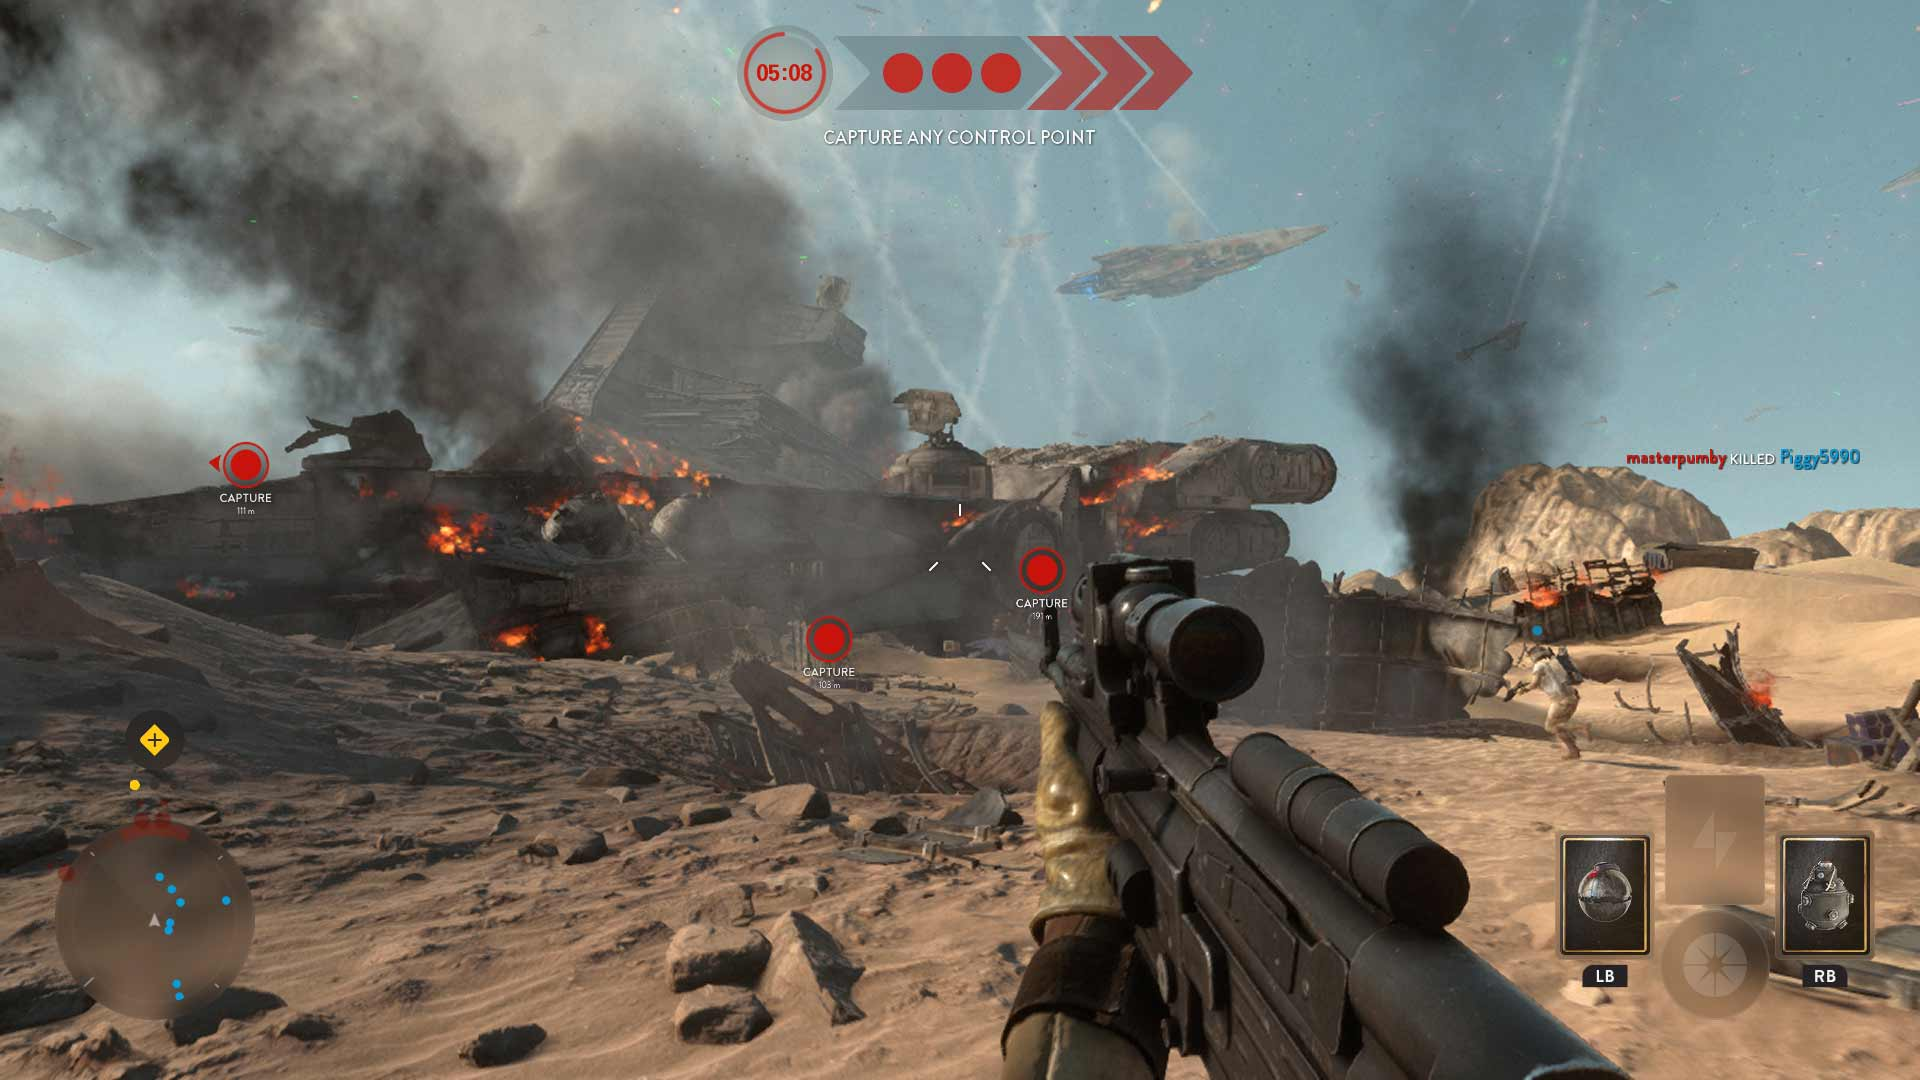 Star Wars Battlefront Battle Of Jakku Impressions Gamerheadquarters